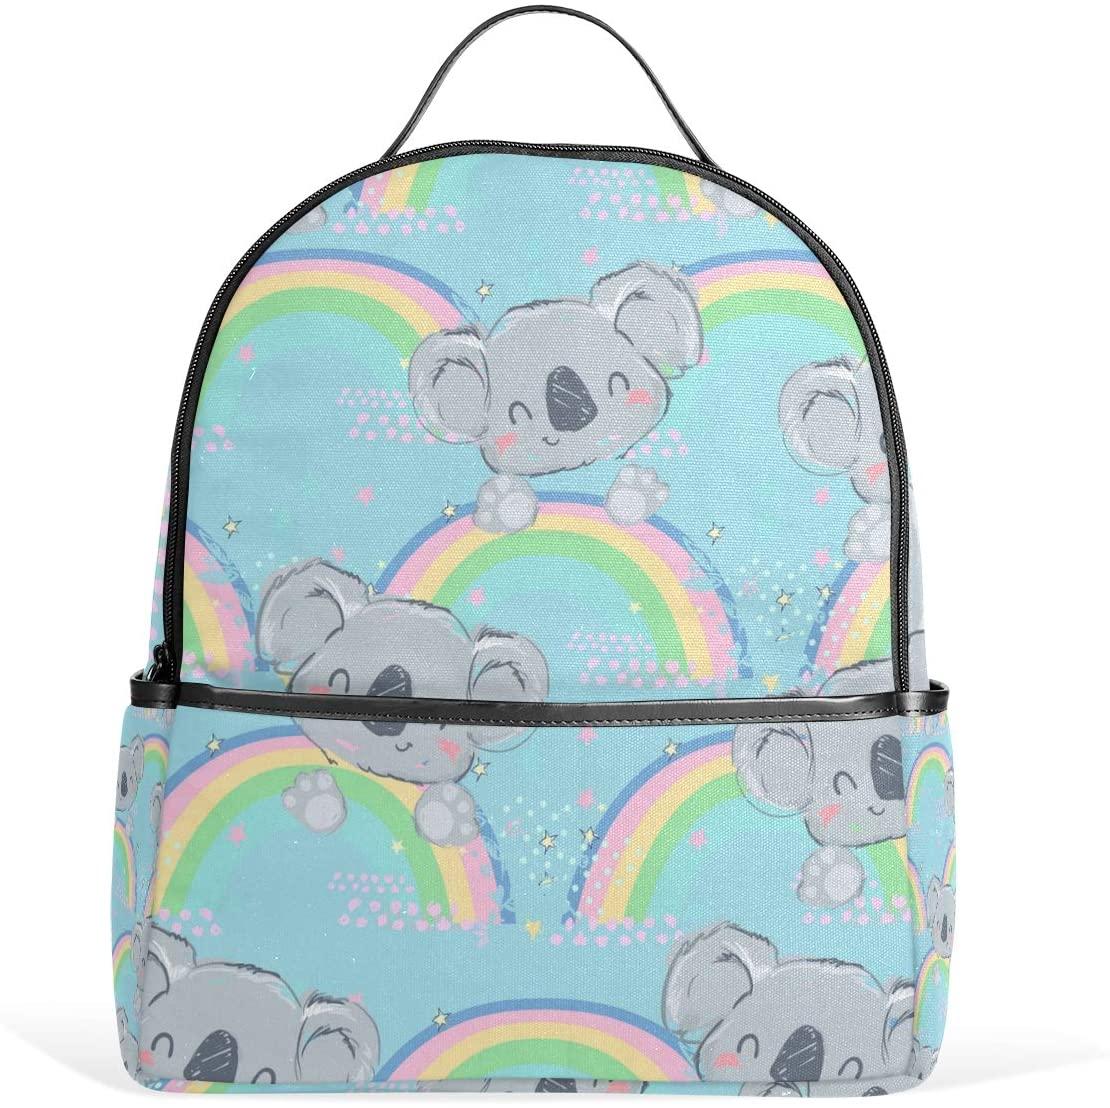 Kids' School Backpack Koala with Rainbow Bookbag for Boys Girls Lightweight Casual Travel Bag Large Capacity Daypack